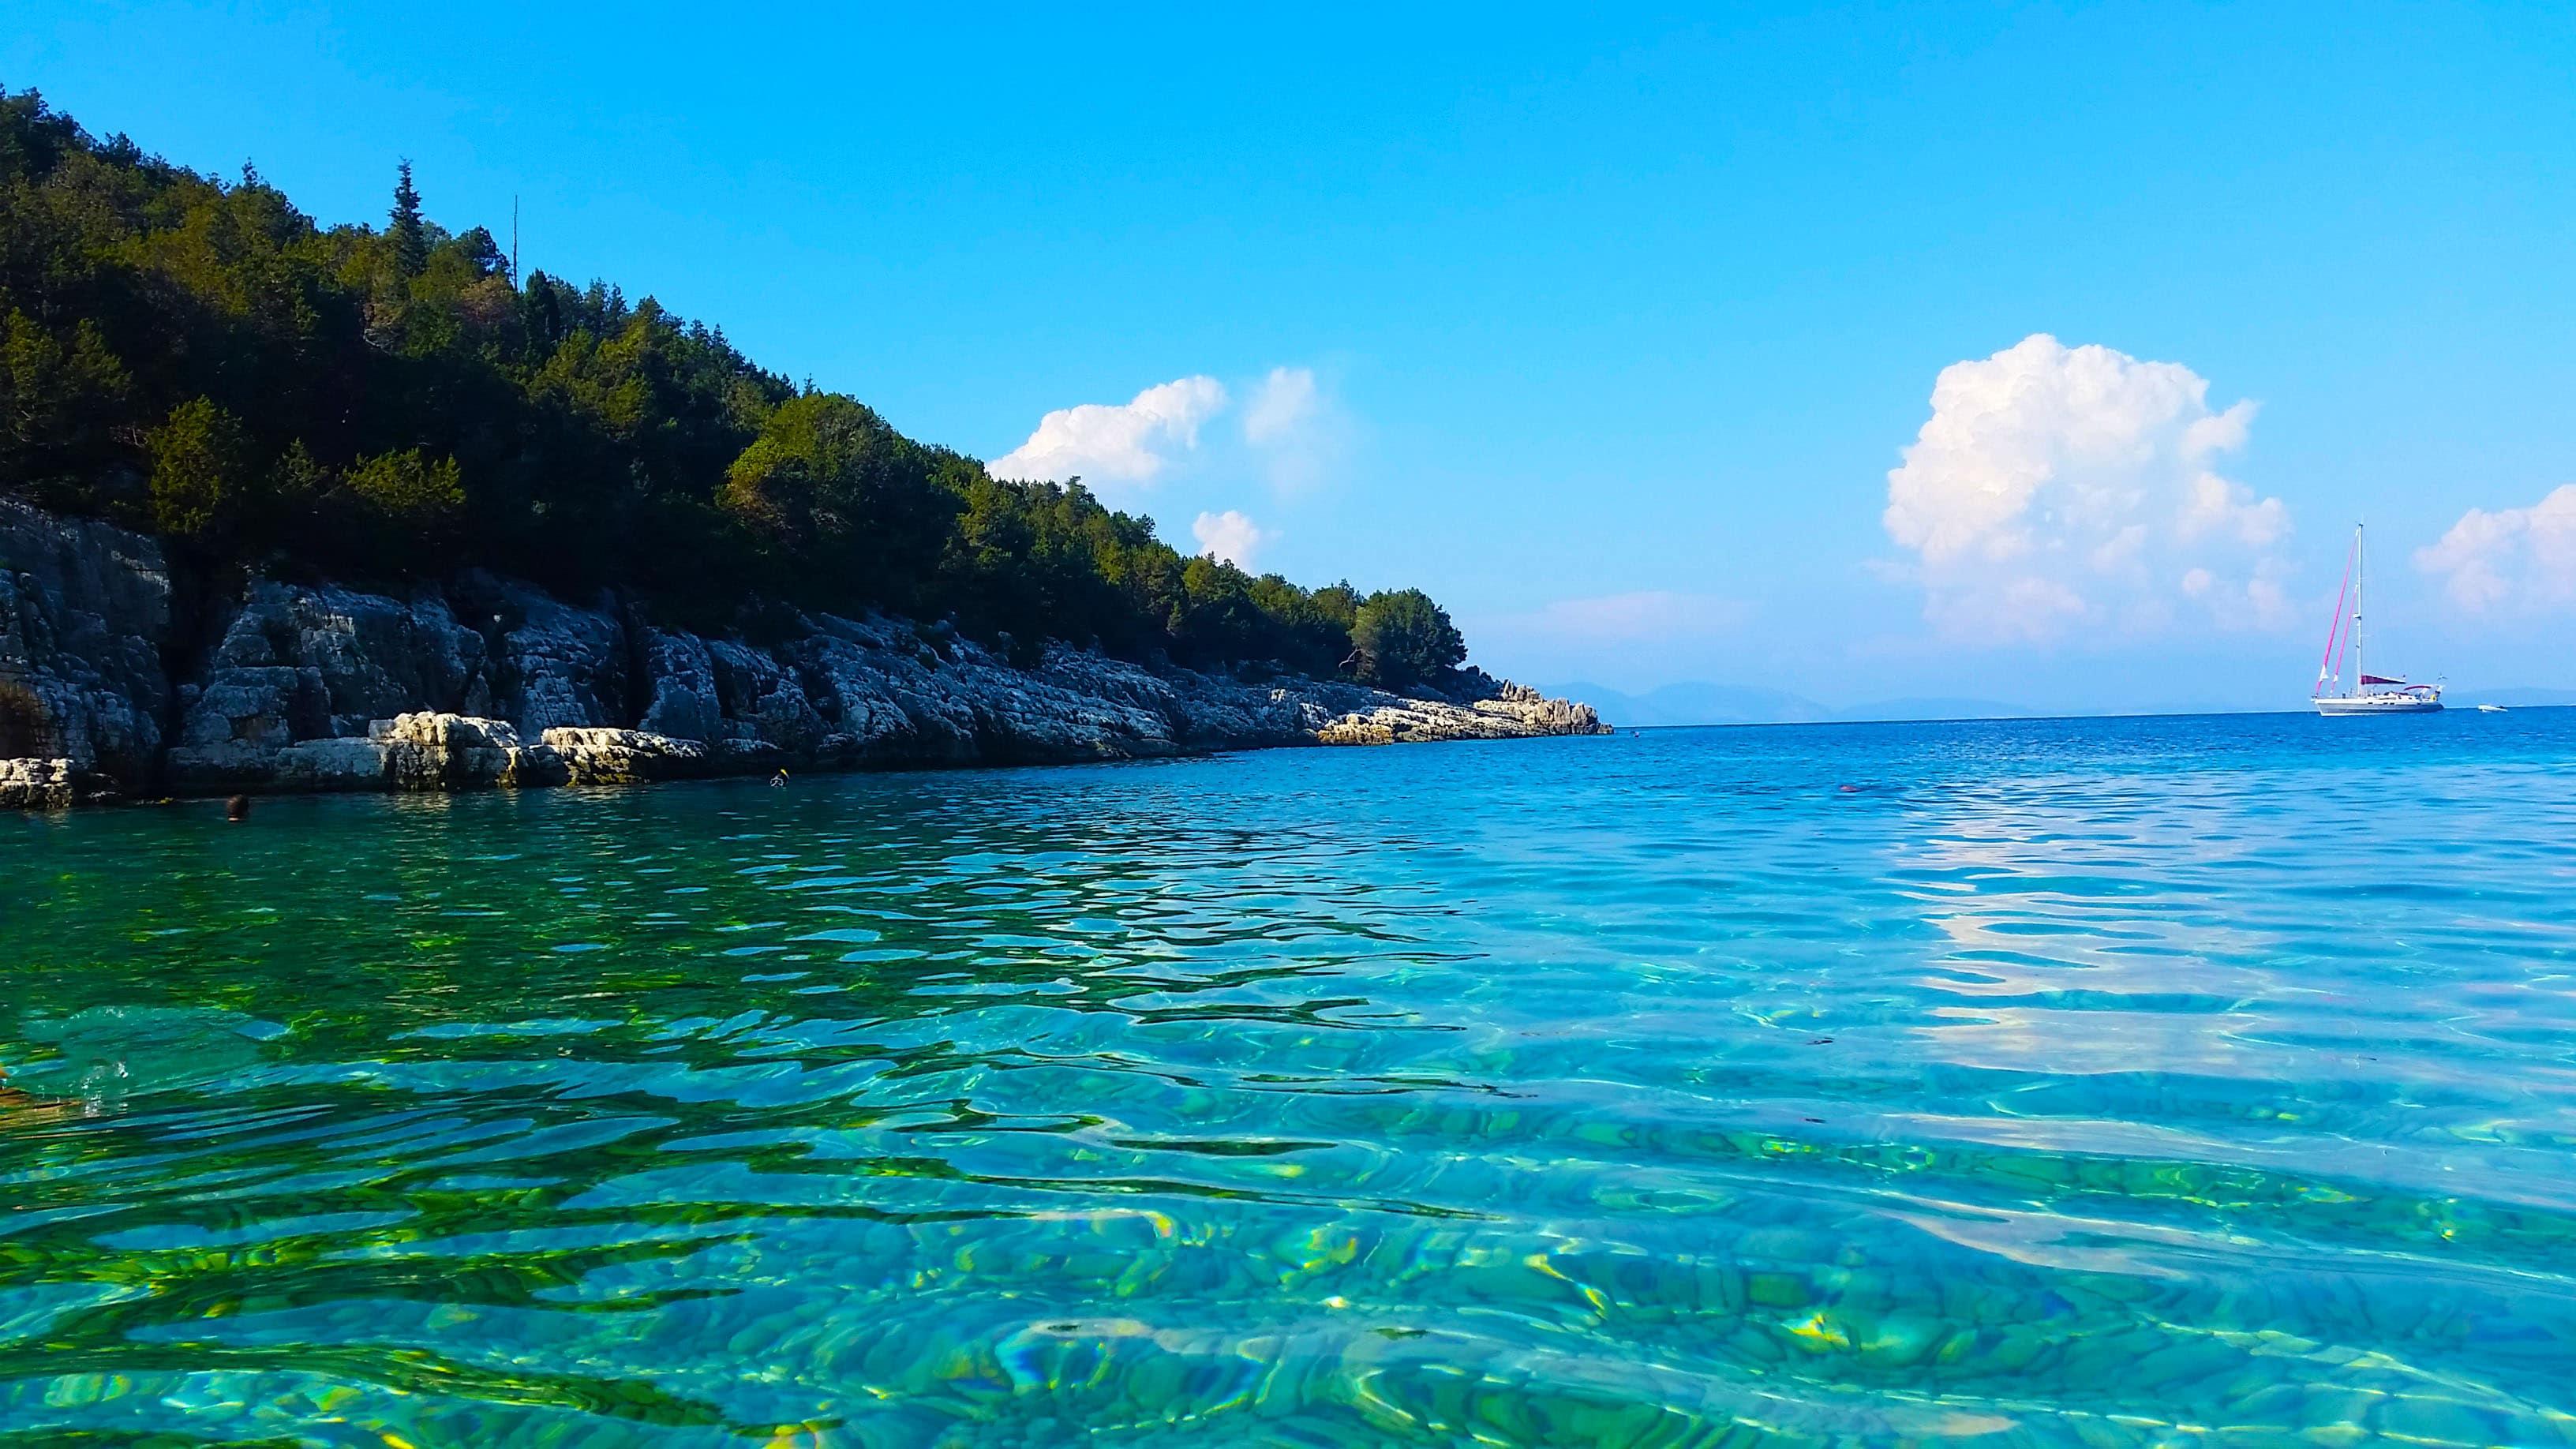 Où dormir à Céphalonie, Kefalonia en Grèce